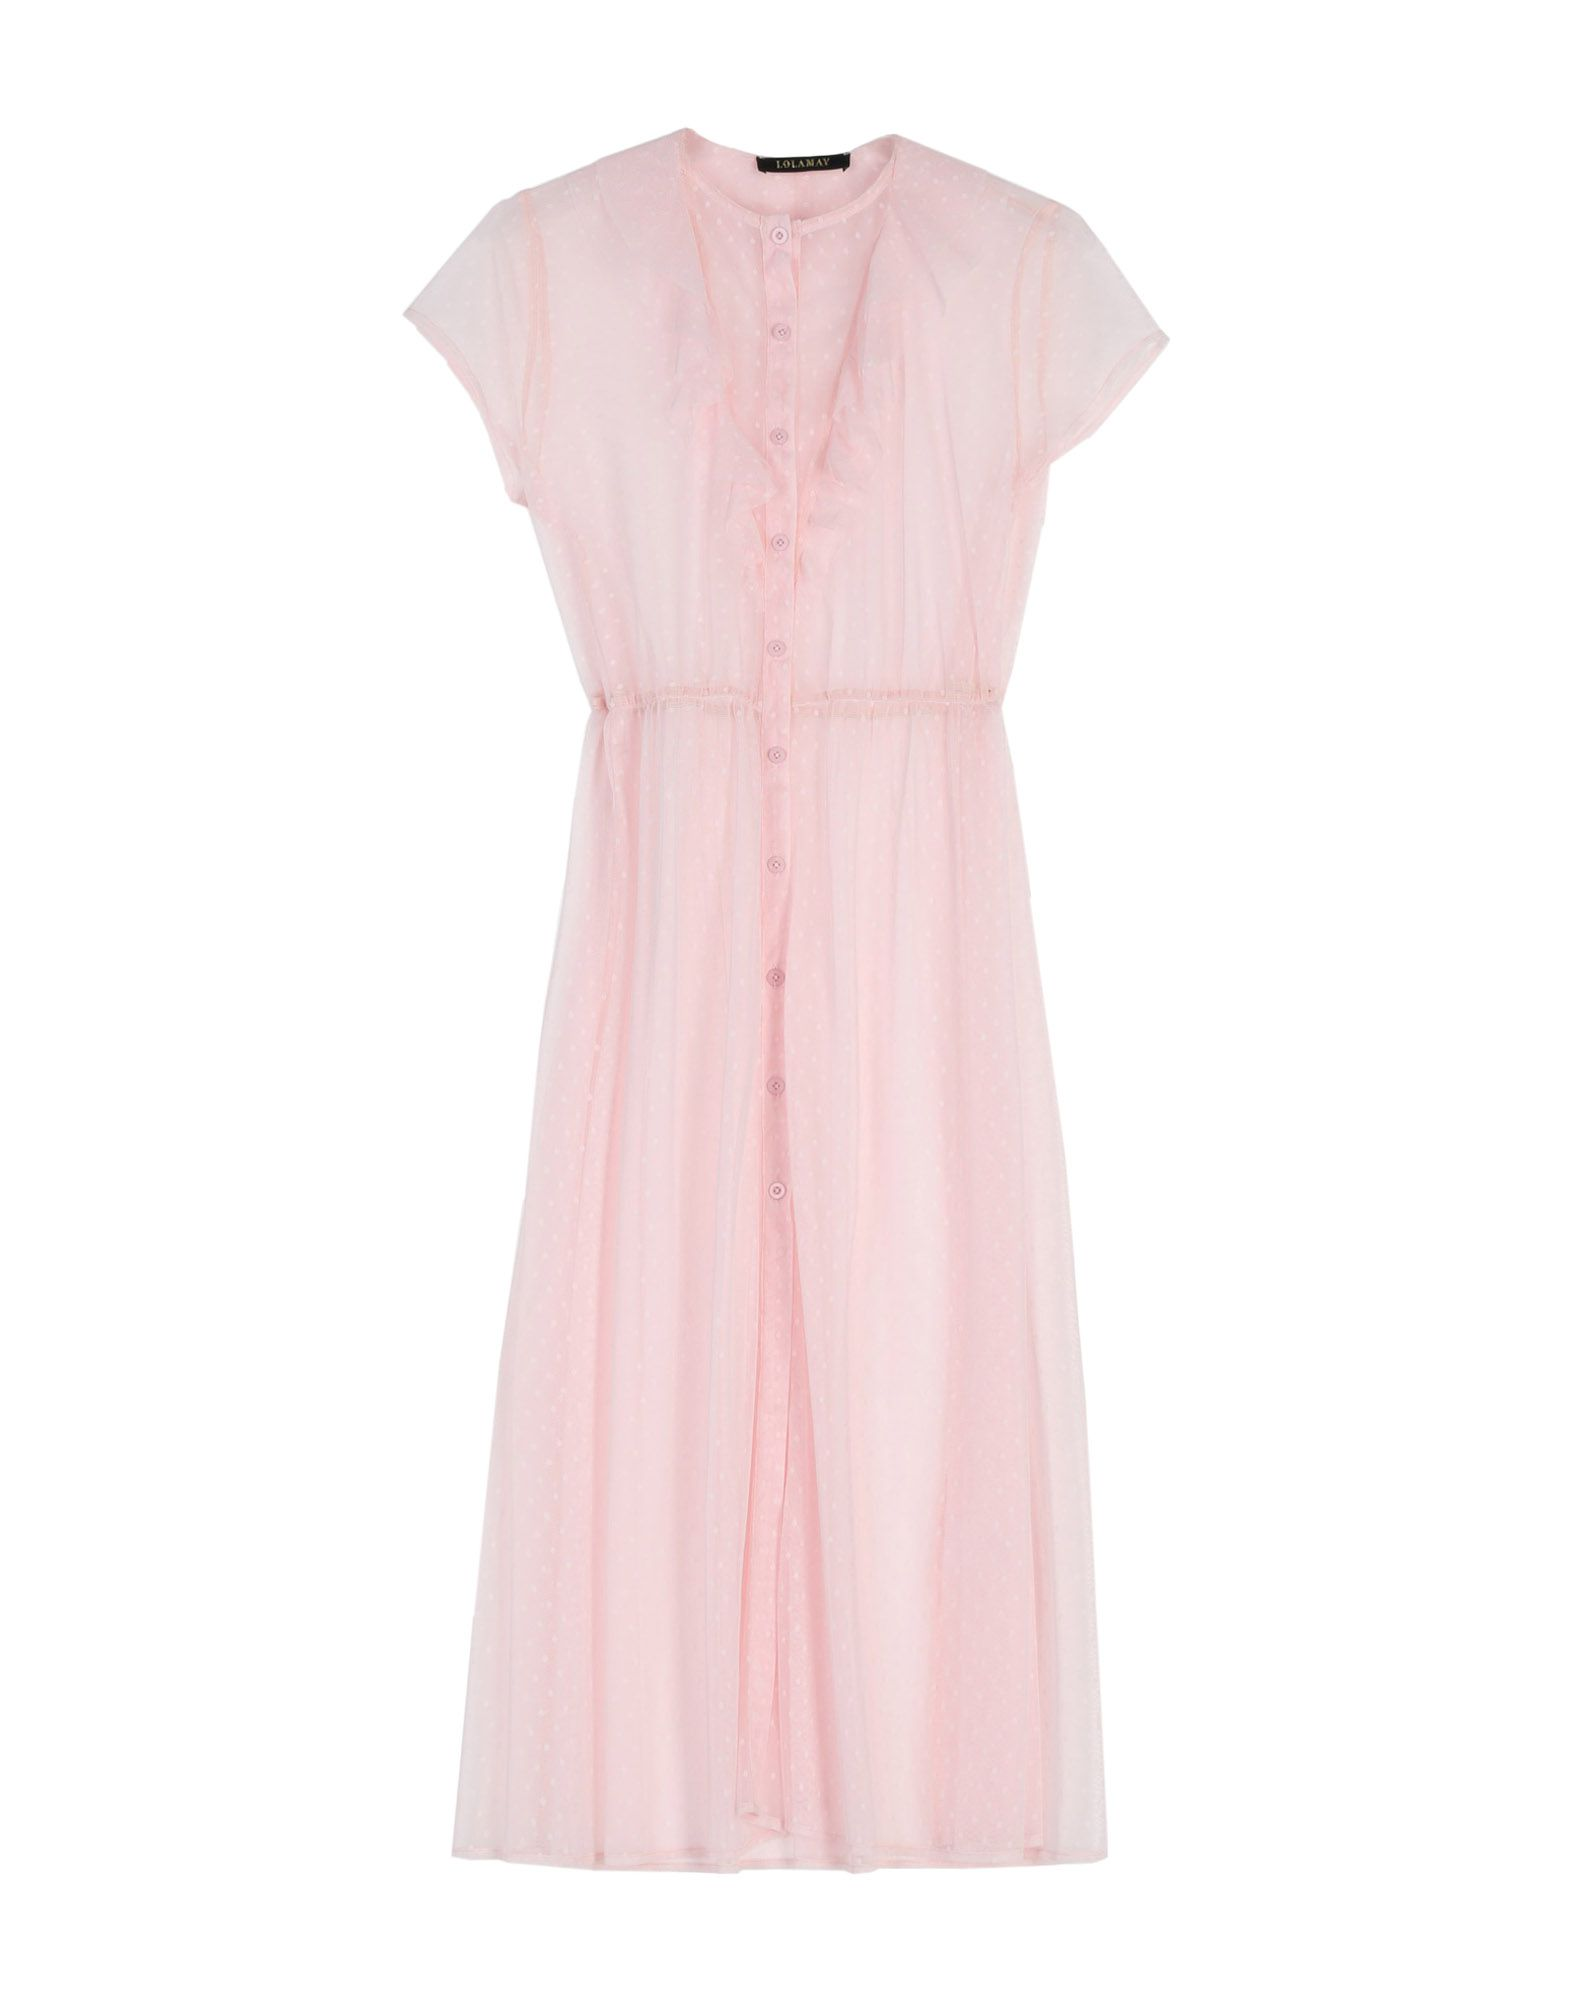 LOLA MAY Платье длиной 3/4 cy may hair 28 28 30